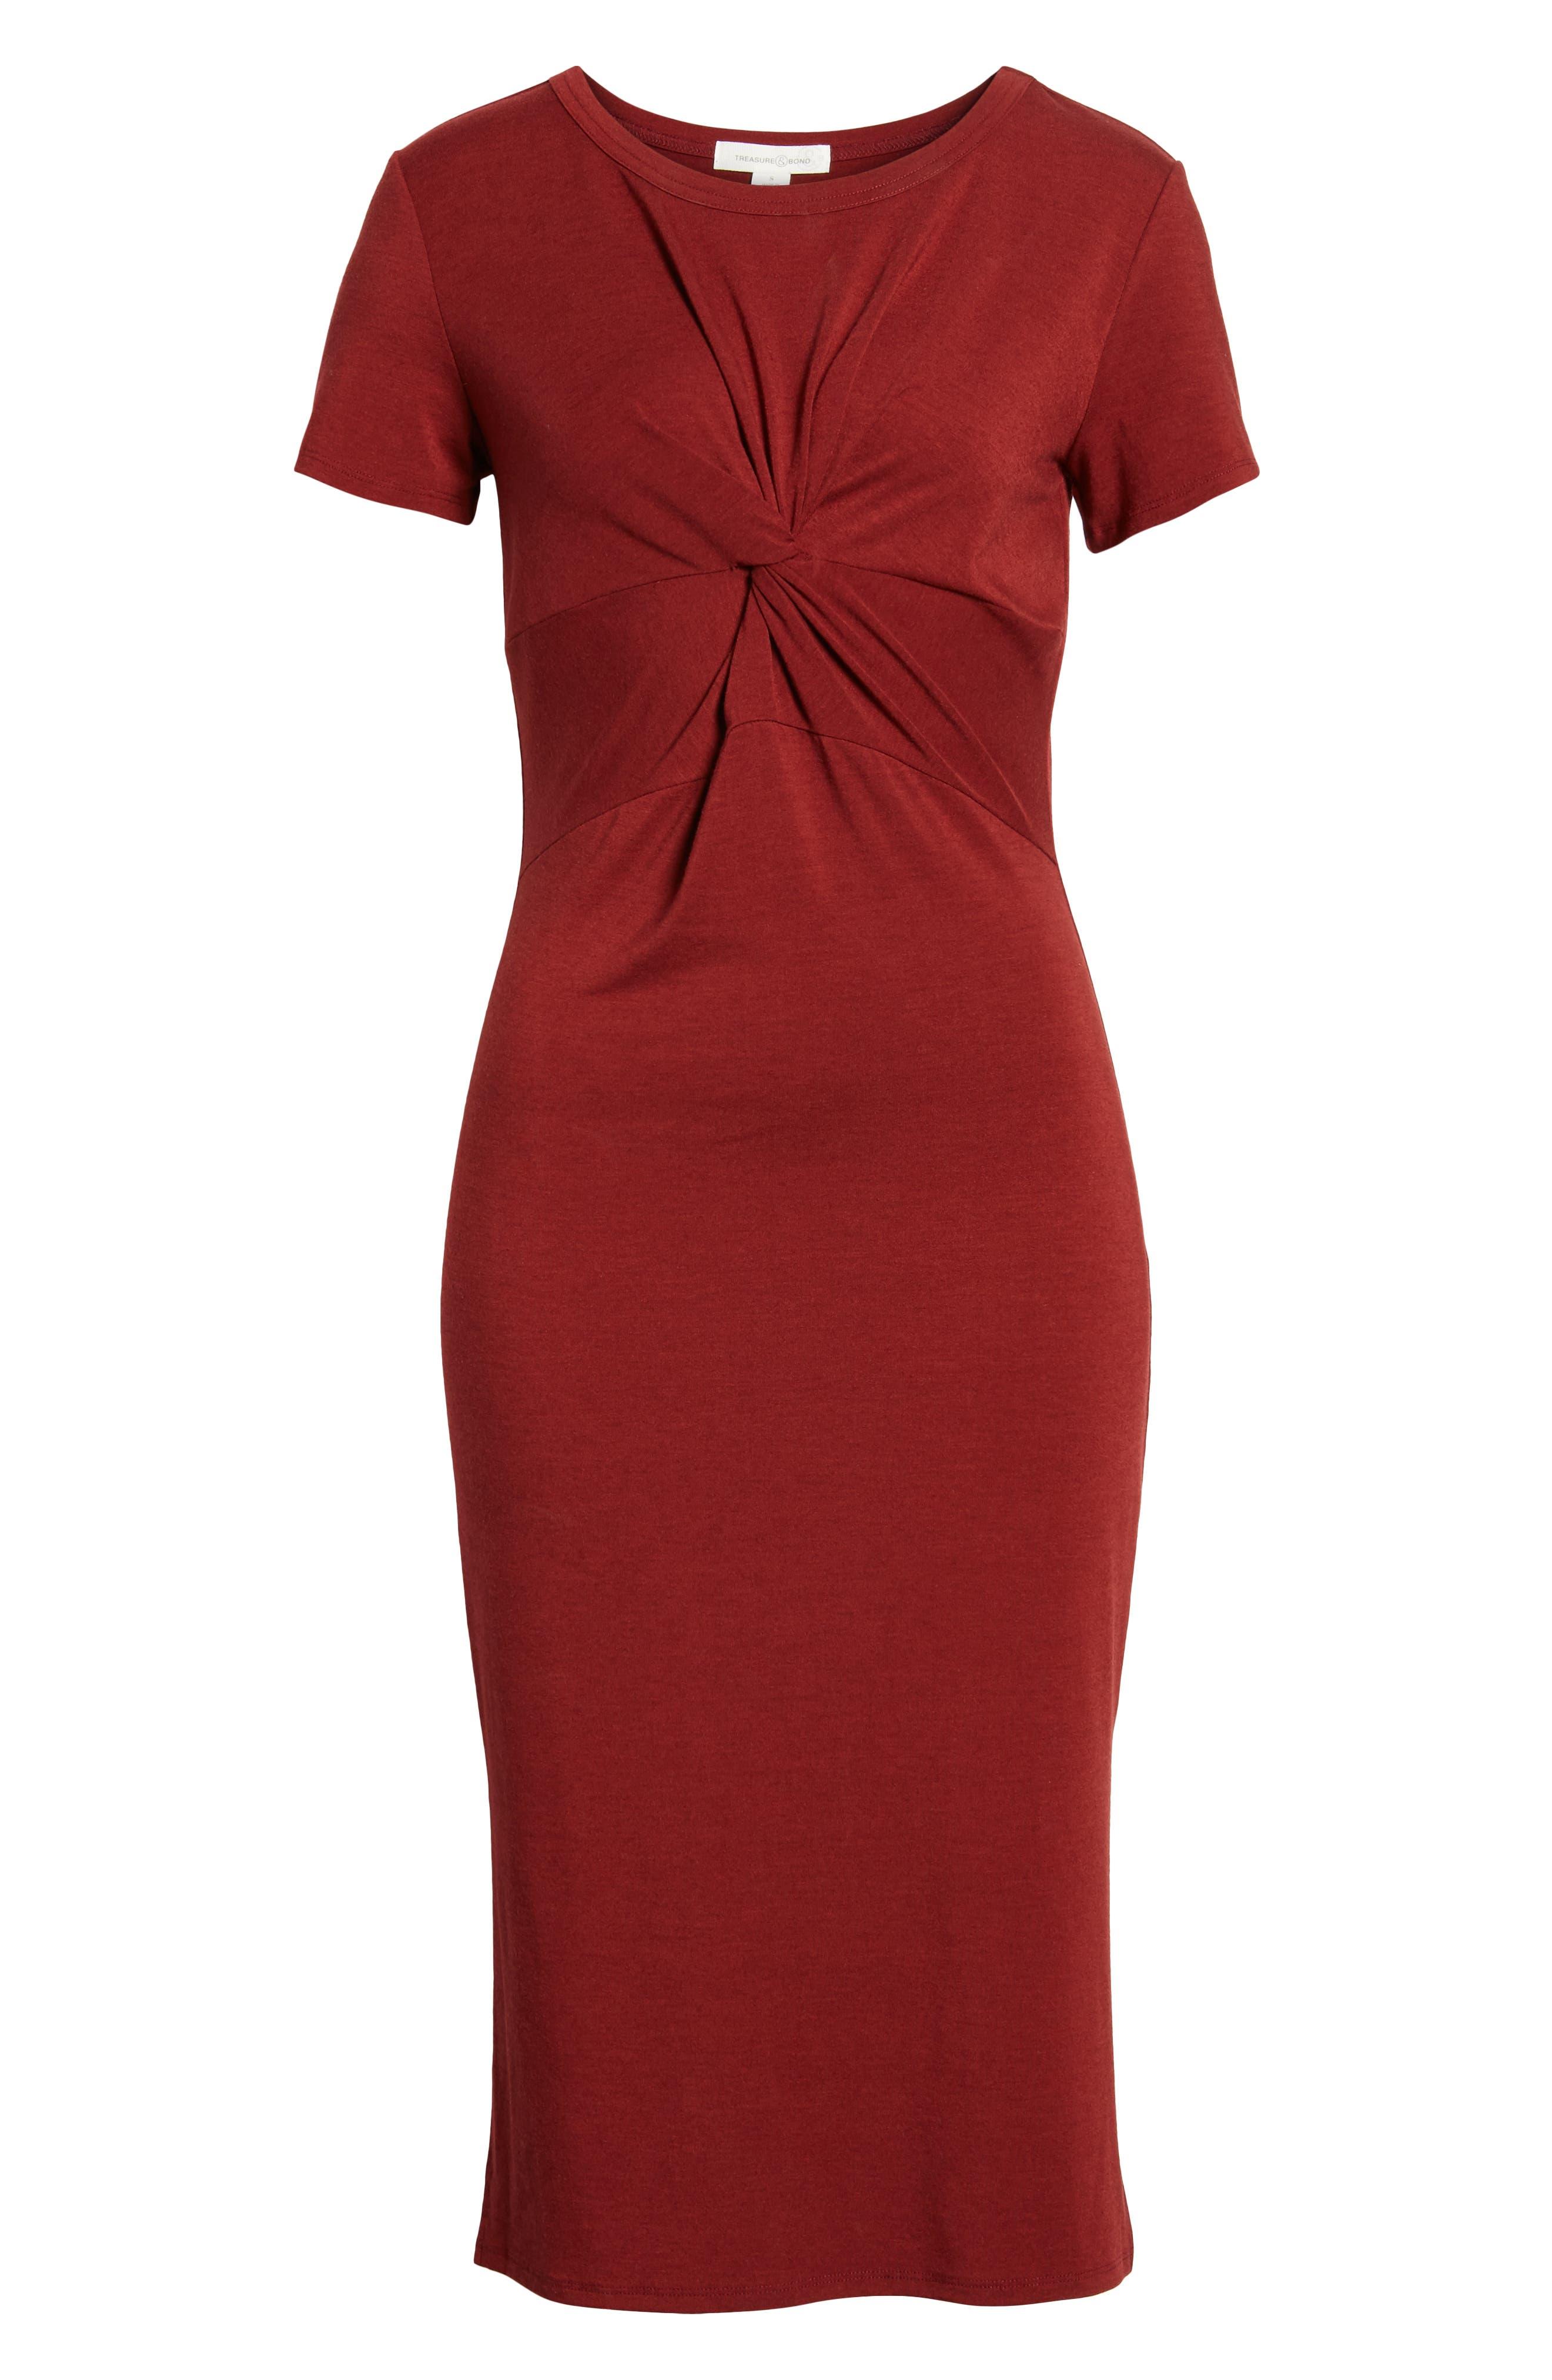 Twist Front Midi Dress,                             Alternate thumbnail 7, color,                             Red Syrah